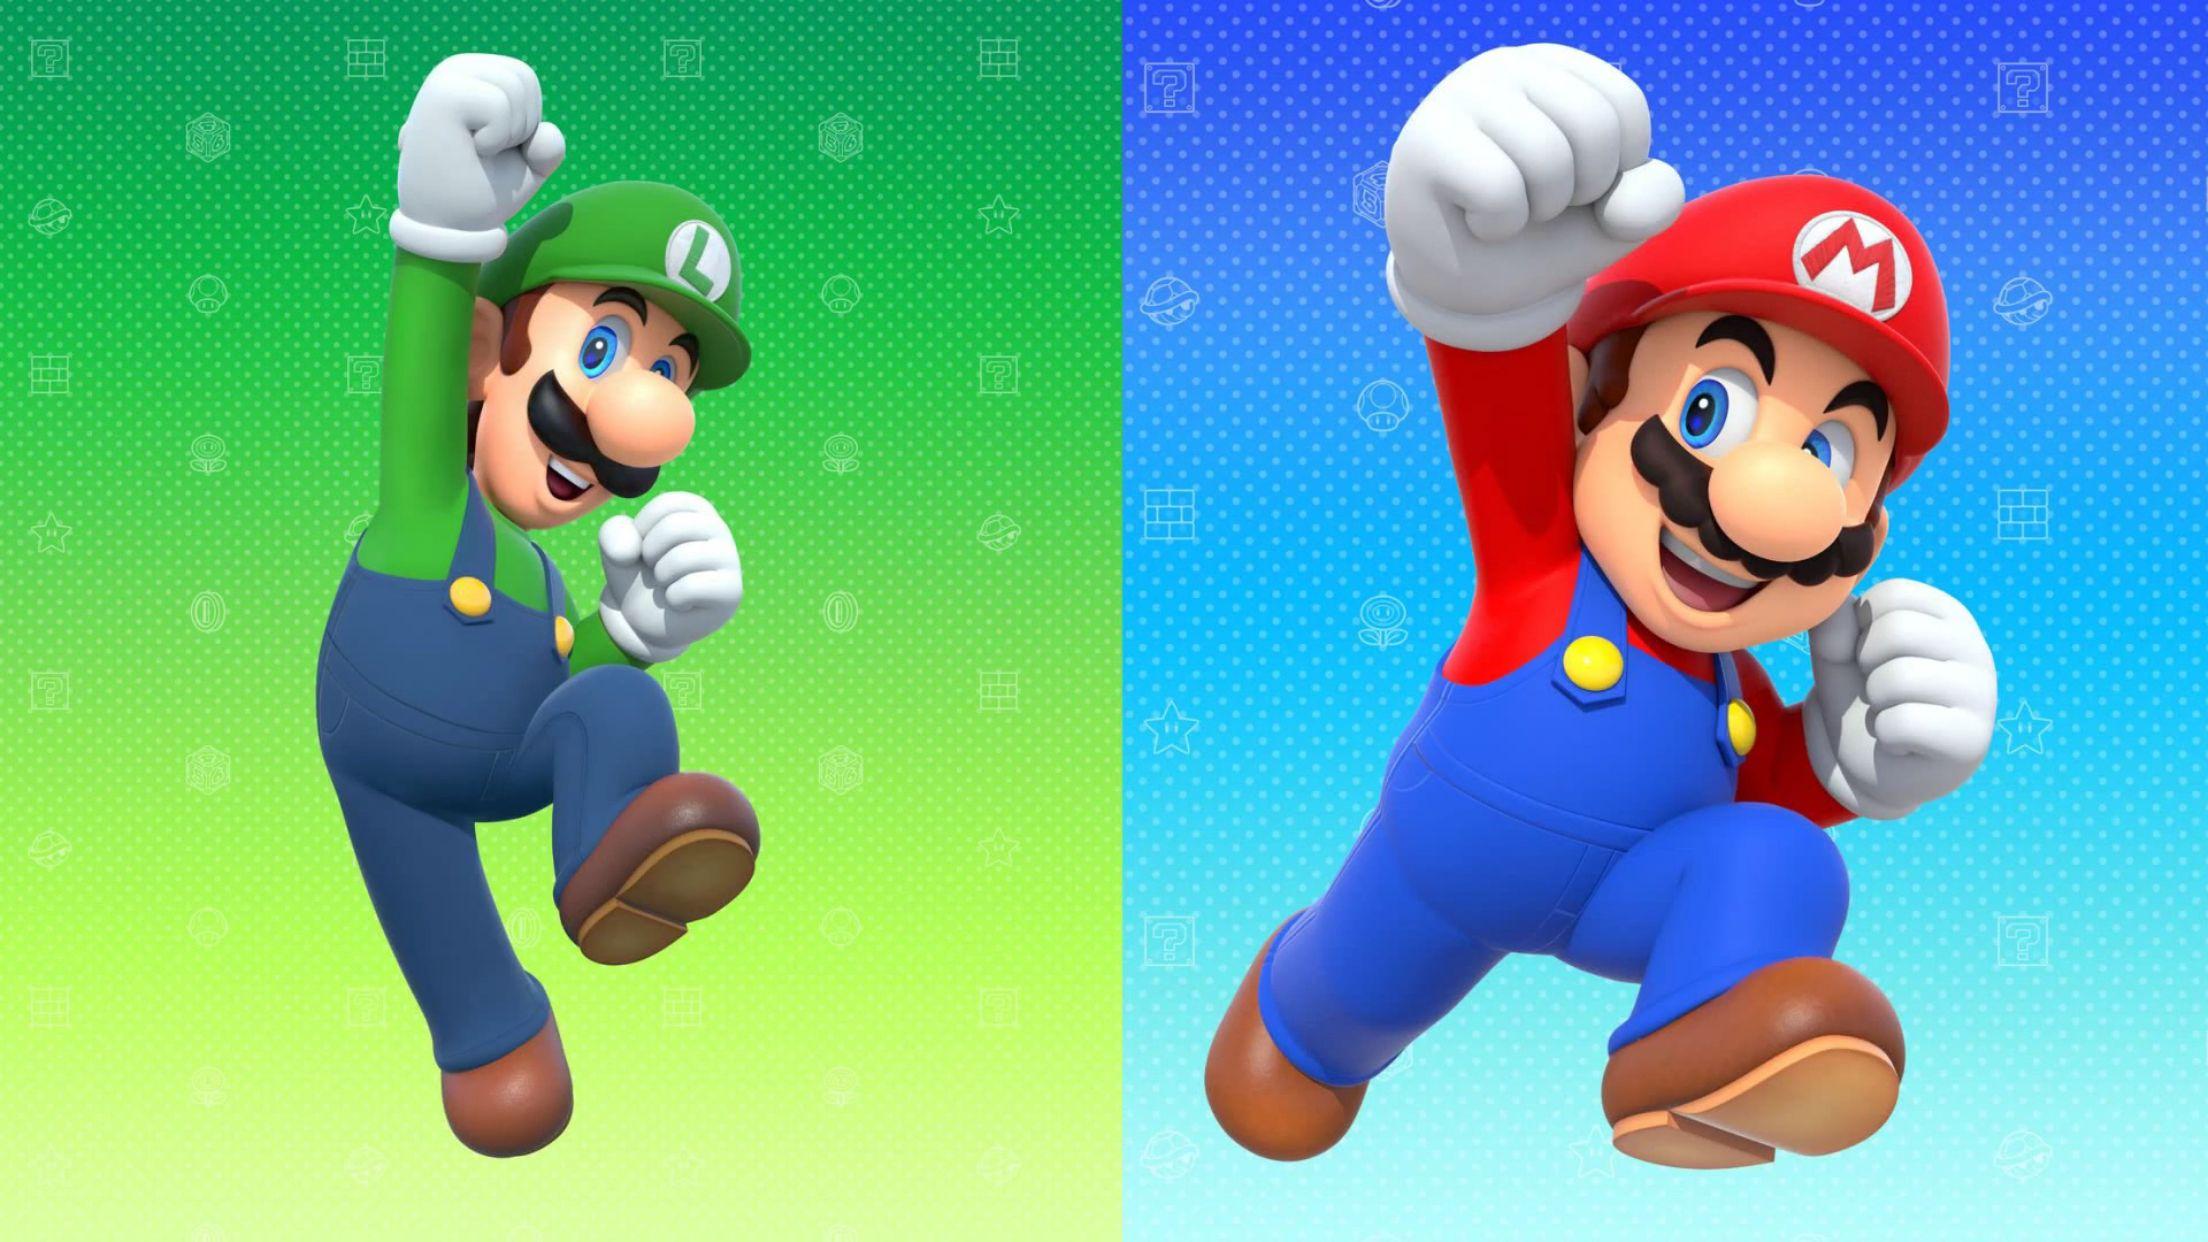 Mario and luigi super mario pinterest mario and - Luigi mario party ...